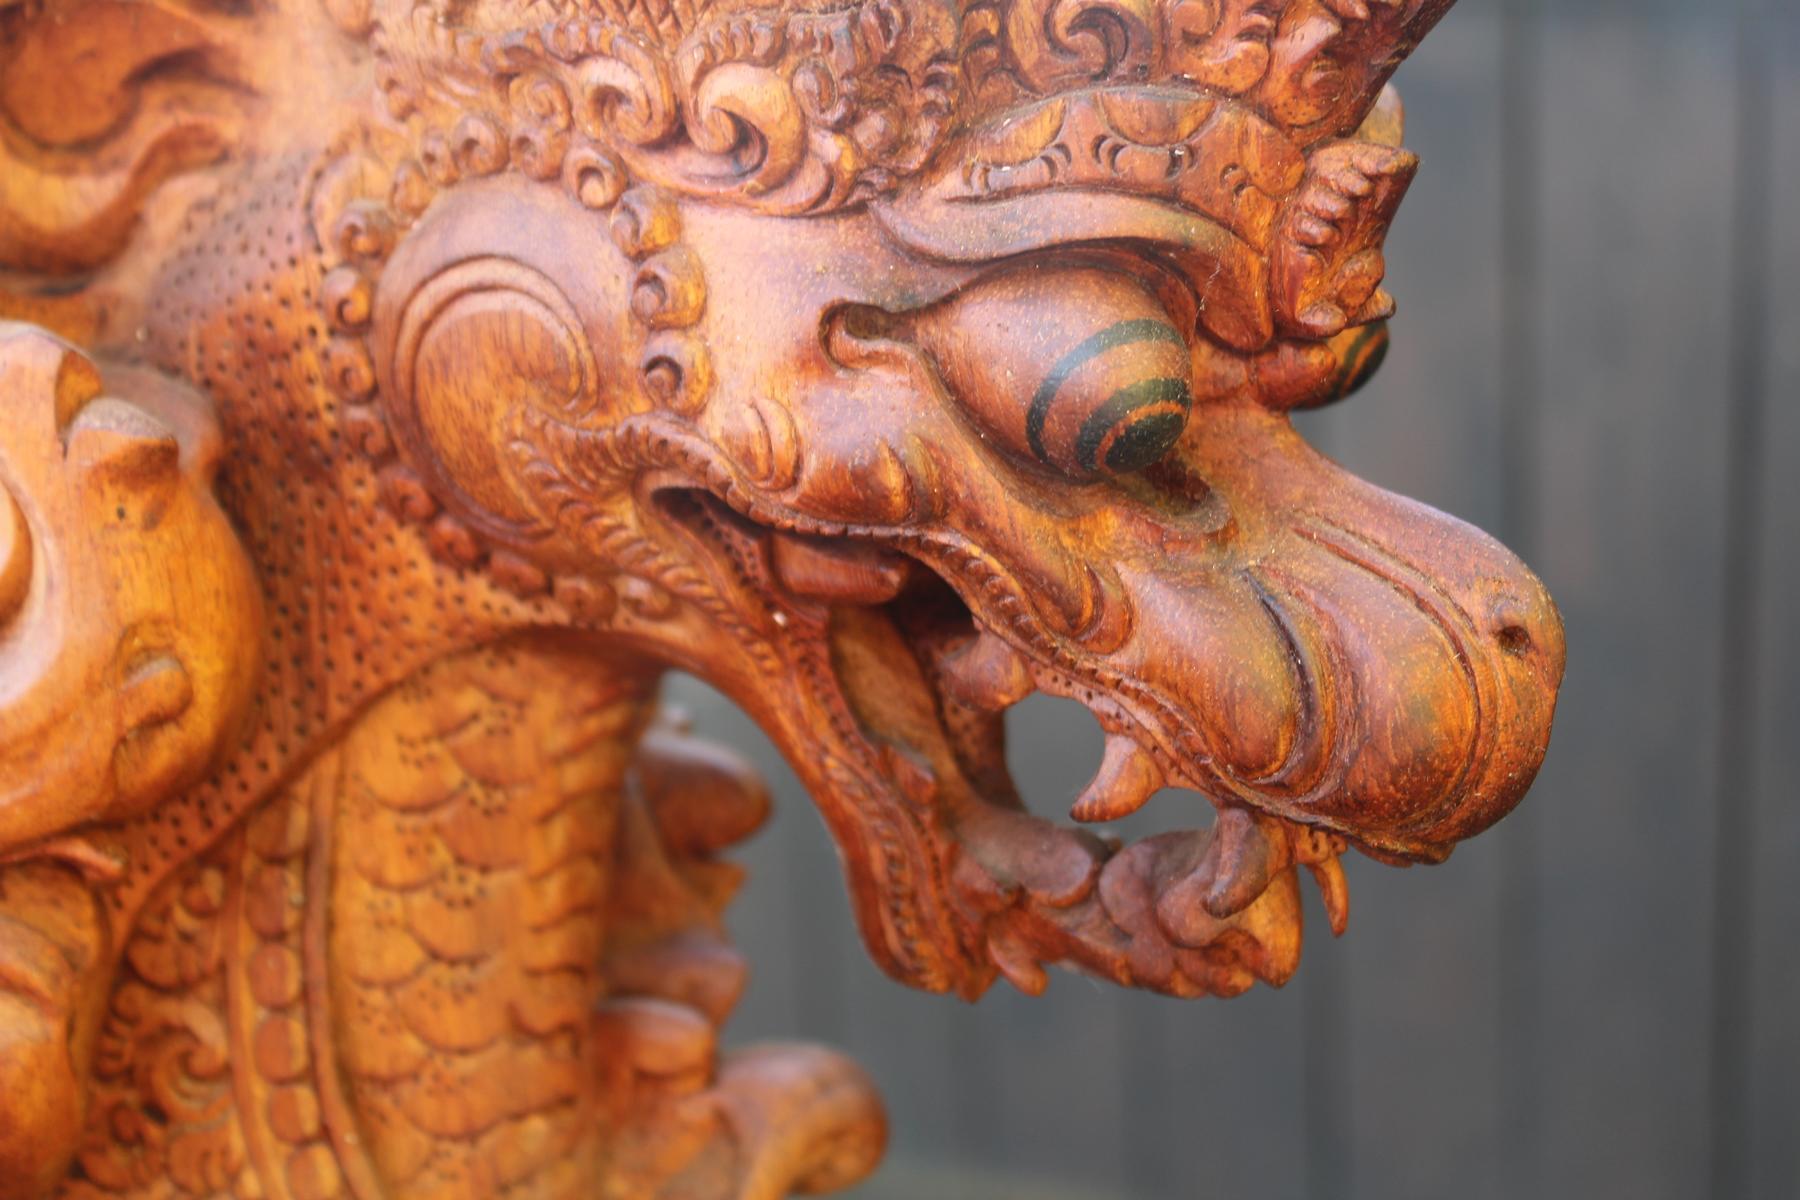 Große Holzskulptur, Indonesien / Bali, 2. Hälfte 20. Jahrhundert-10